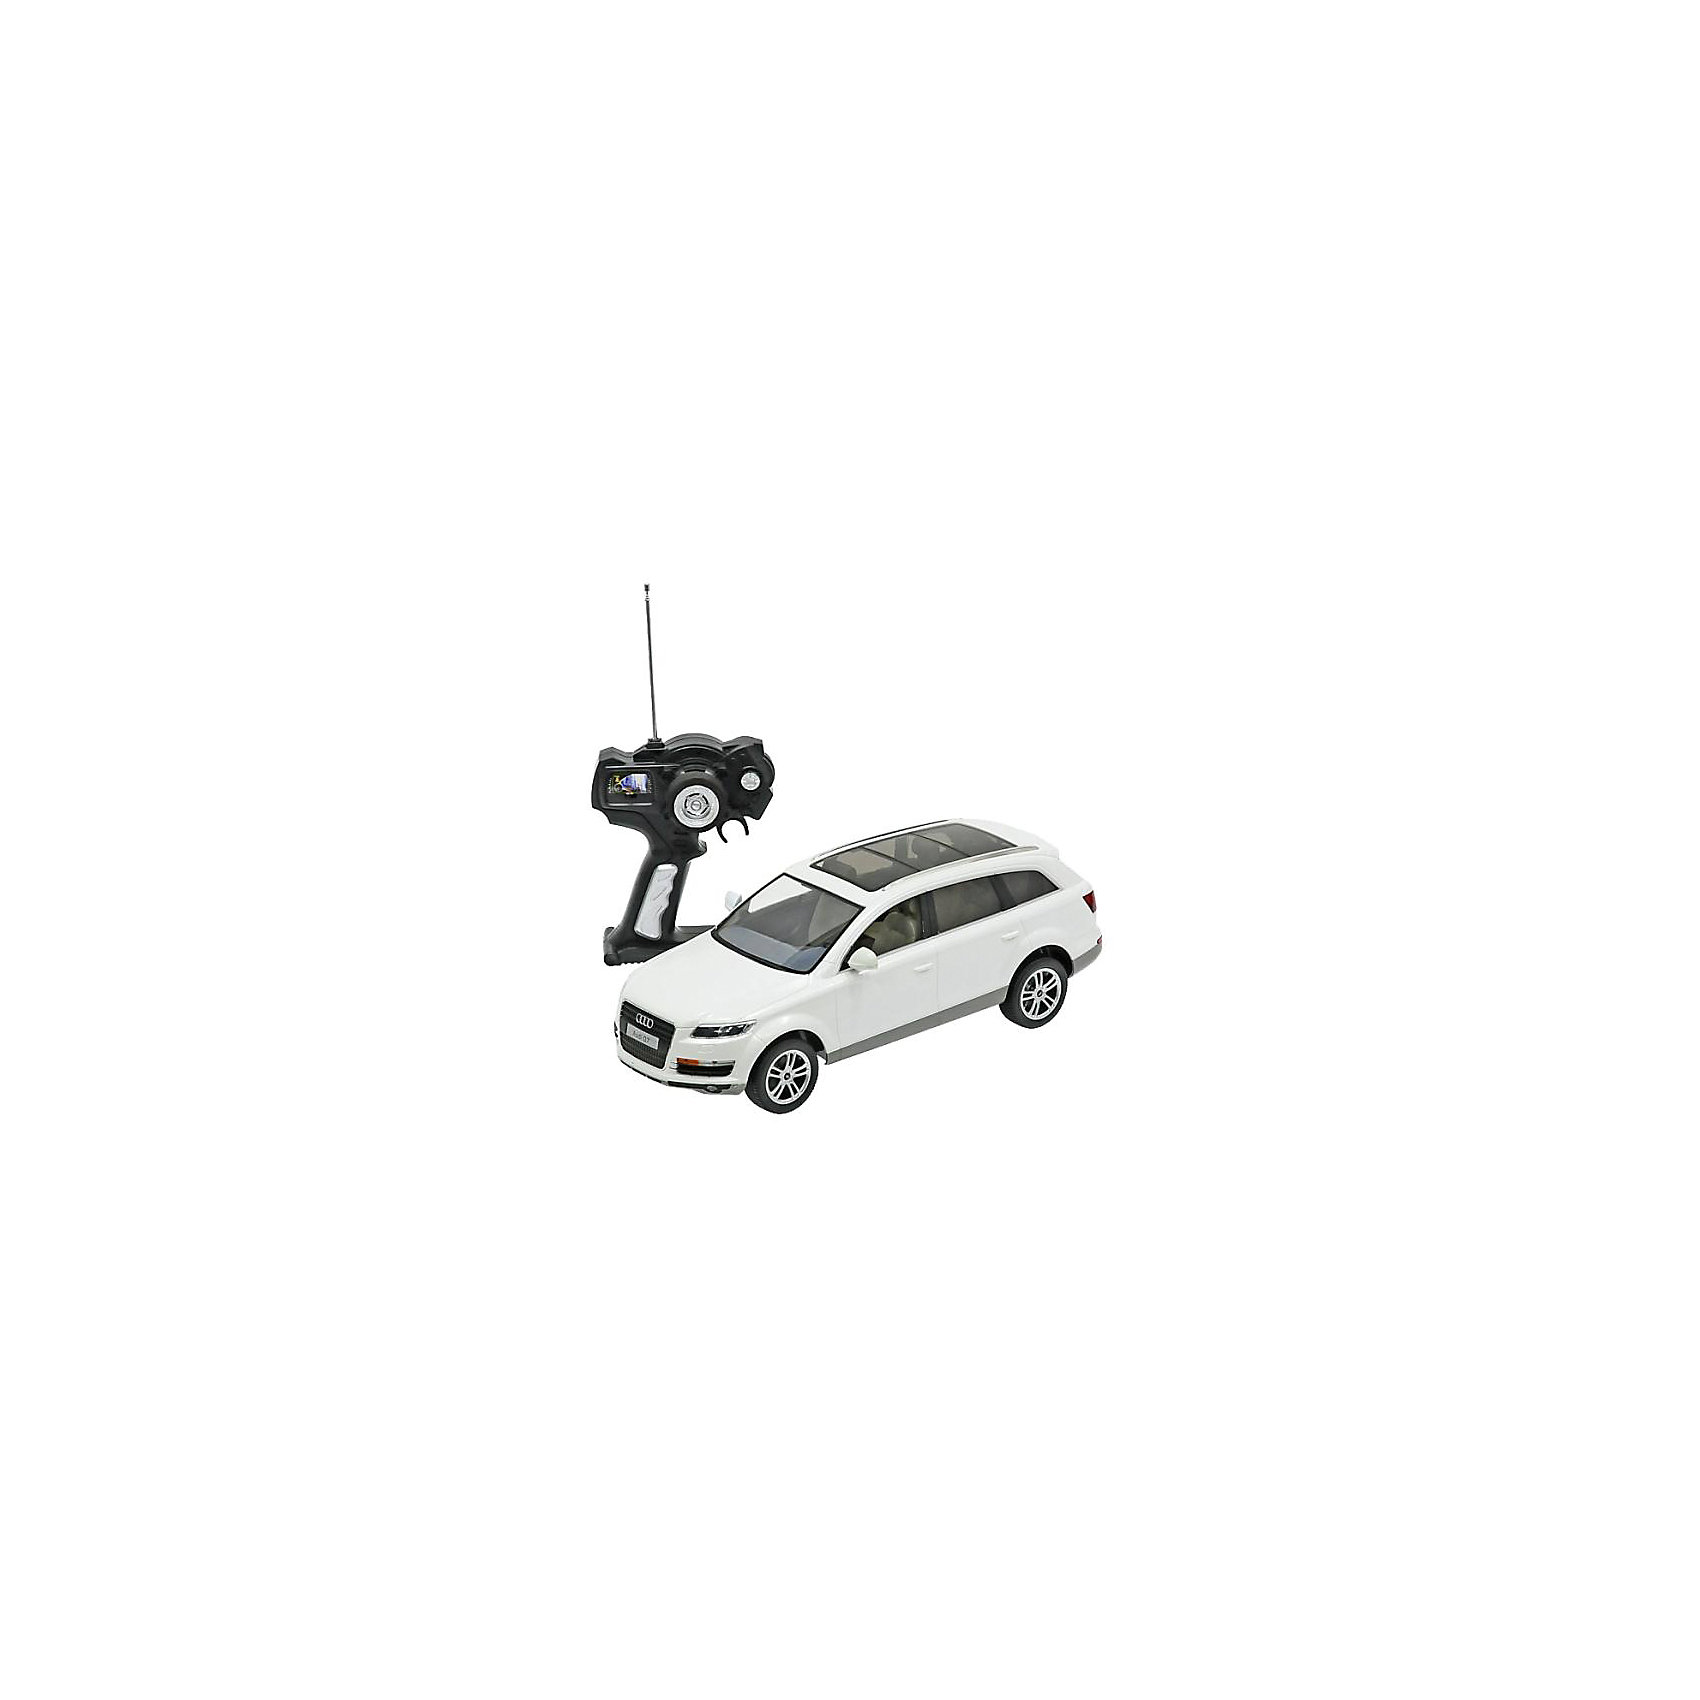 - Машина AUDI Q7 1:14, свет, на р/у, RASTAR, белый купить автомобиль б у в донецке до 33000 грн